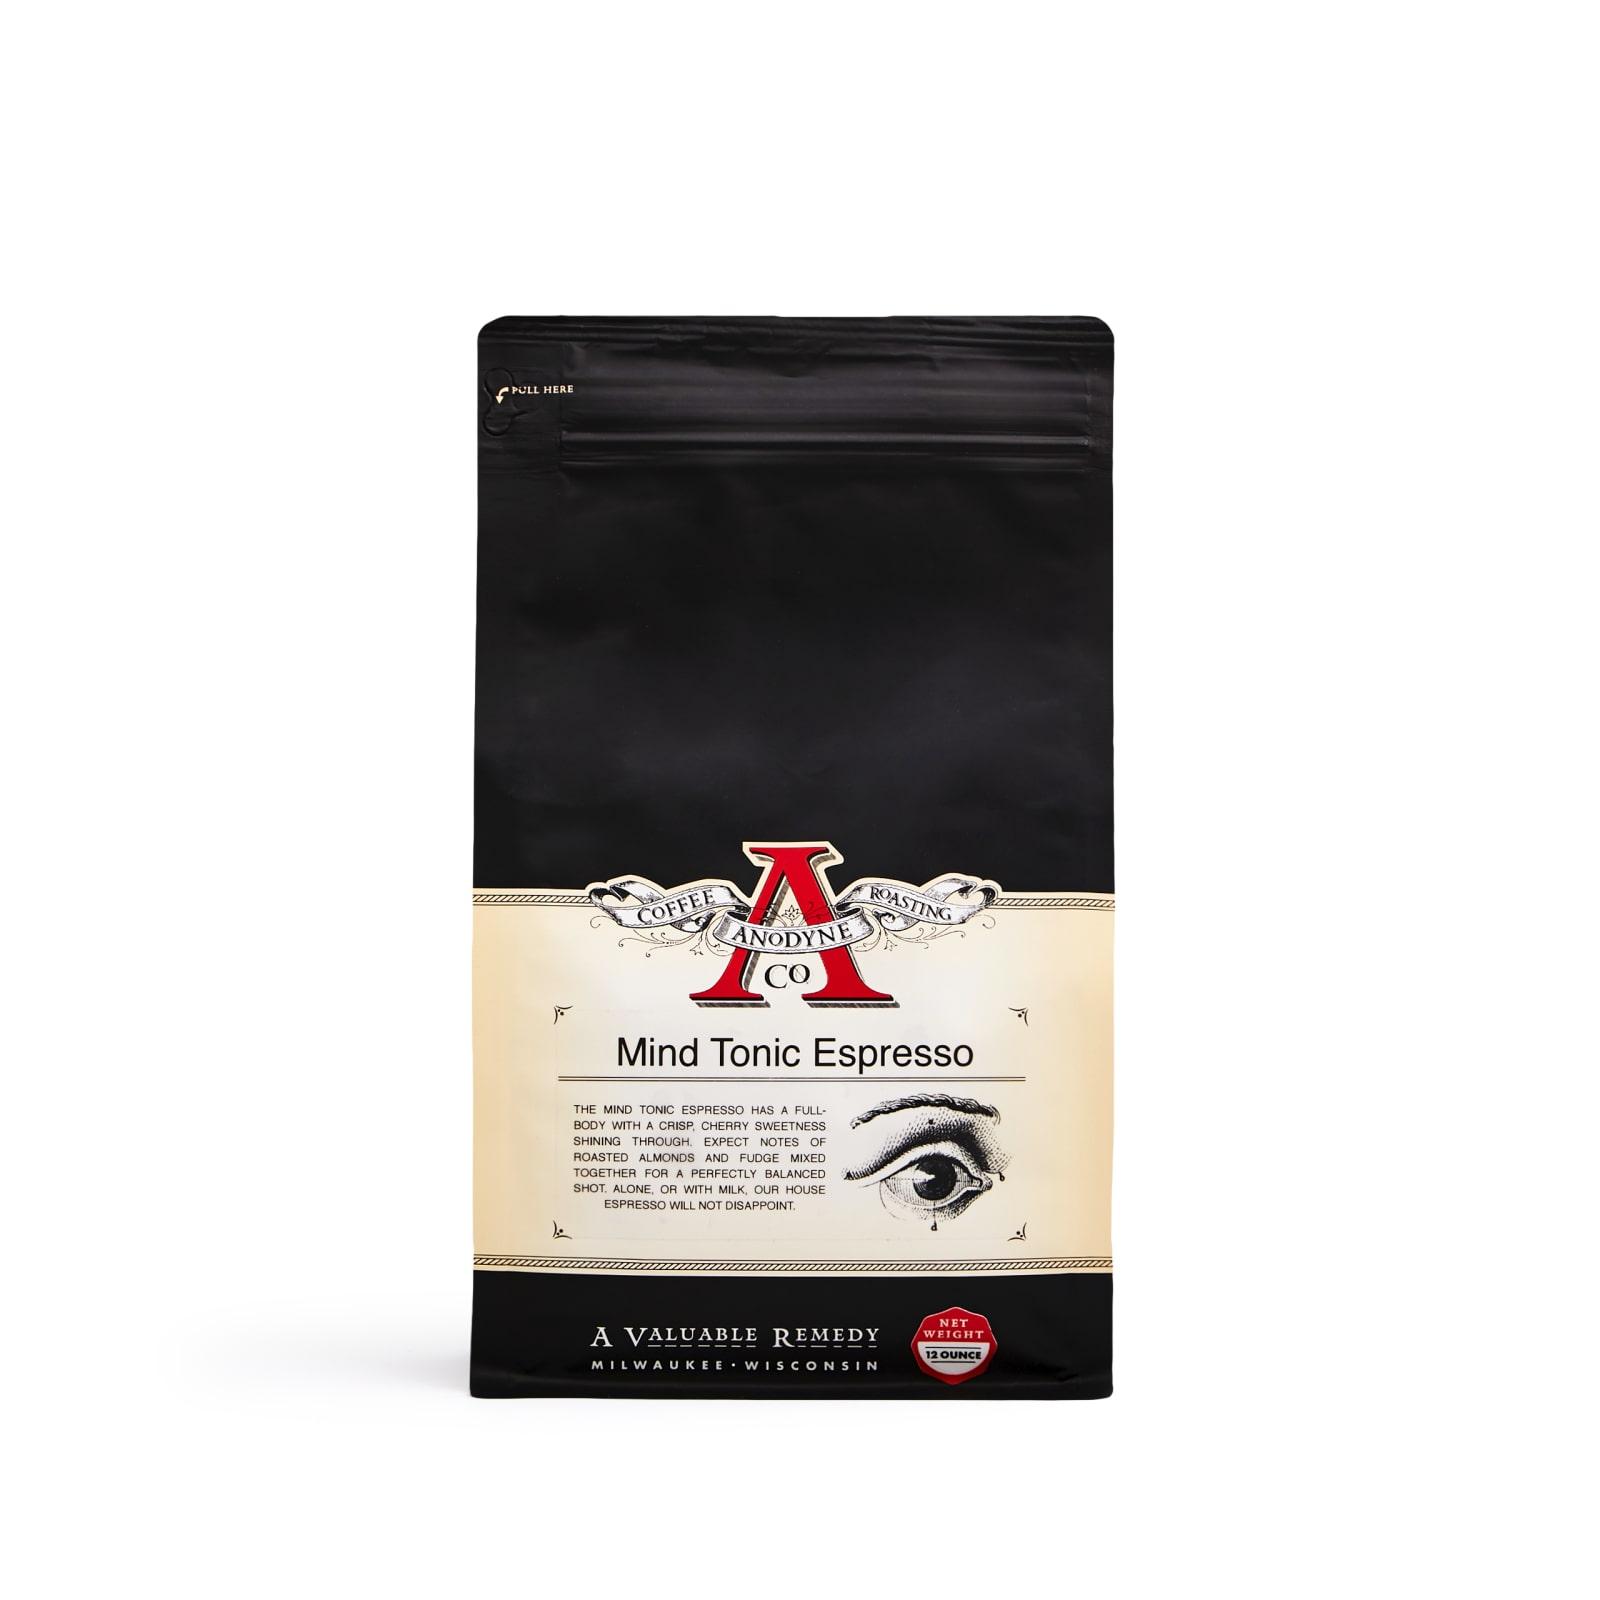 Mind Tonic Espresso